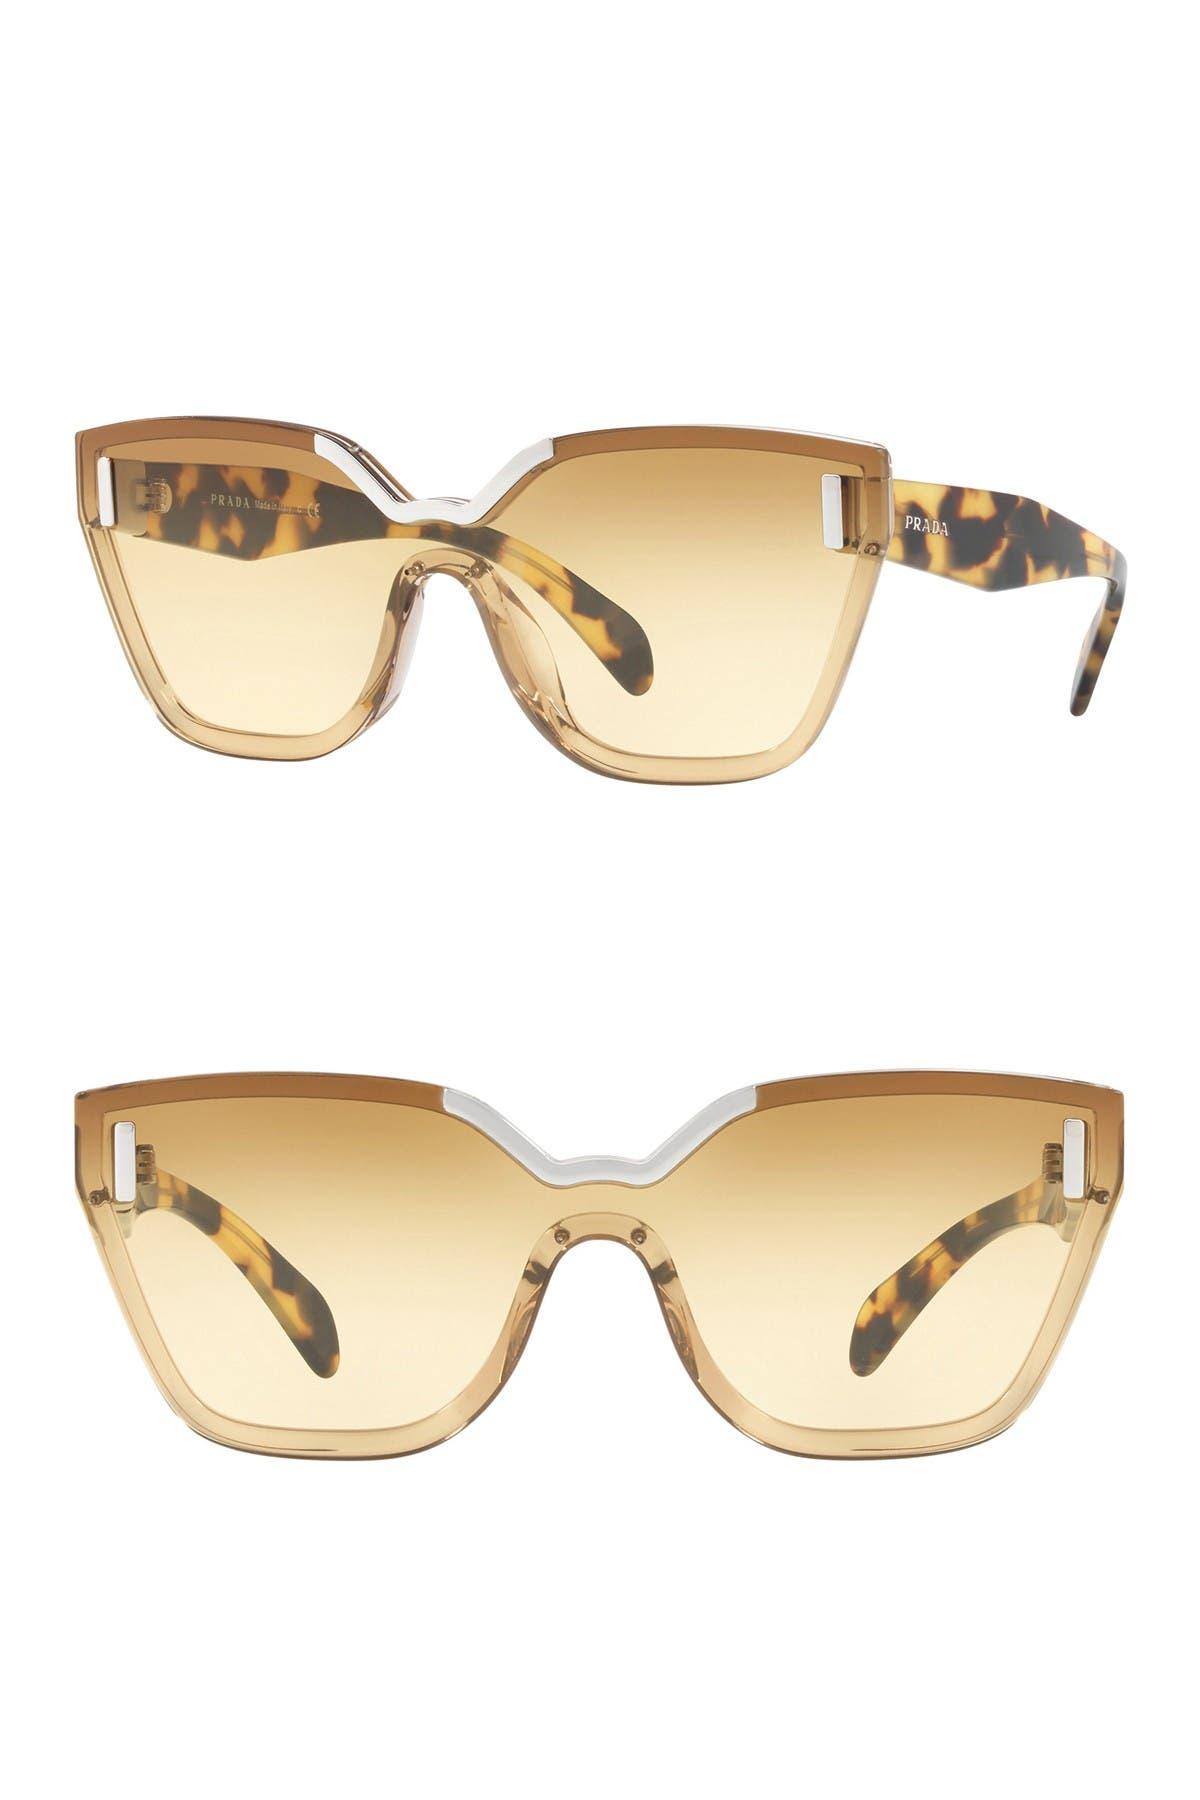 Image of Prada 56mm Irregular Sunglasses